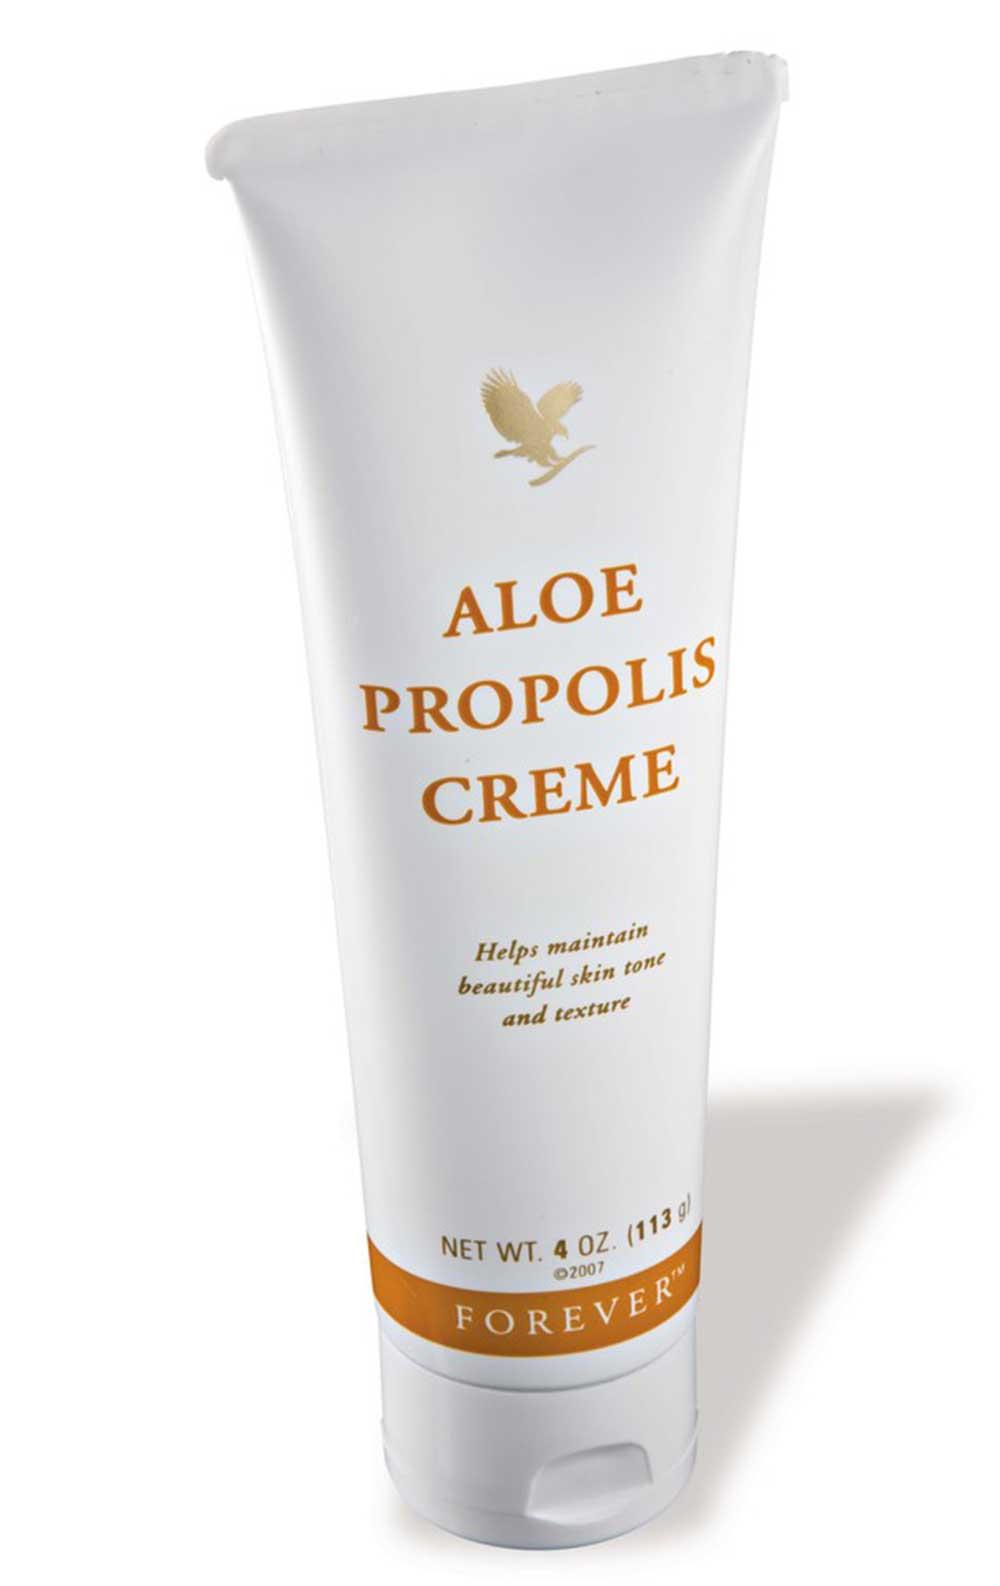 Forever Aloe Propolis Creme 113g Buy in Bangladesh